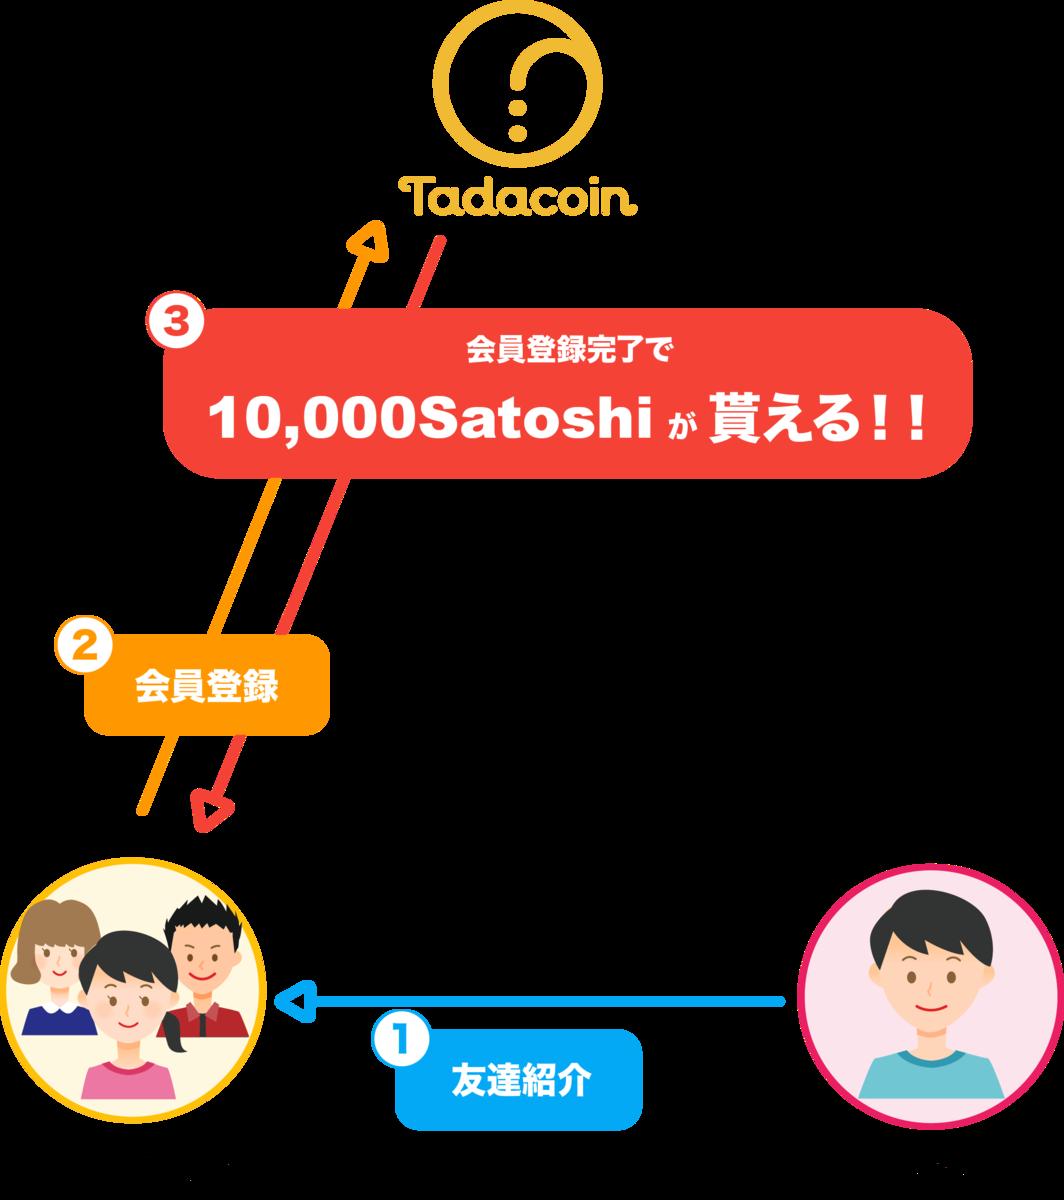 f:id:seikatsumigarufx:20190720015059p:plain